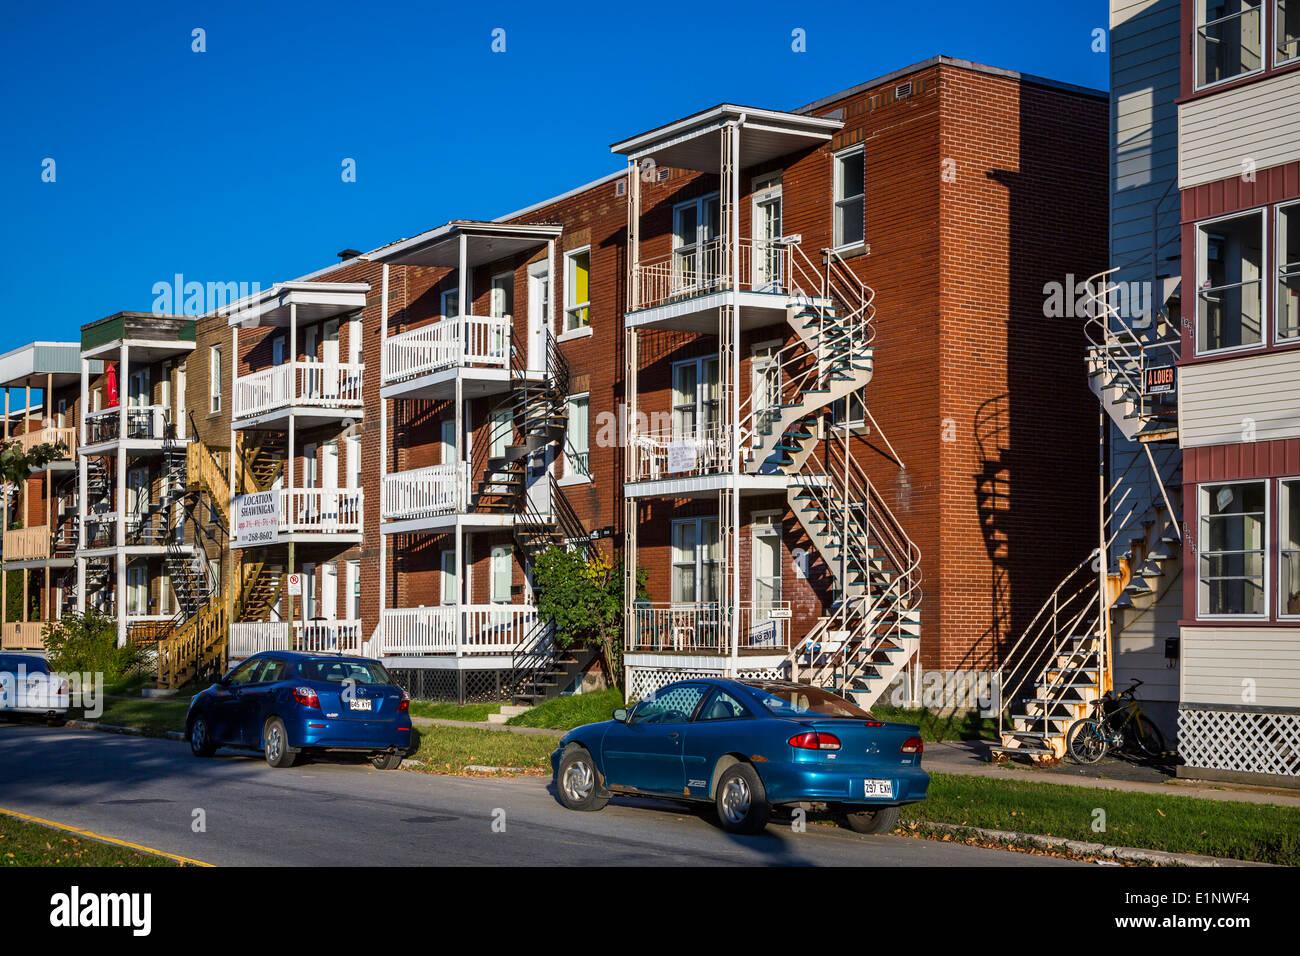 Three story apartment blocks on a street in shawinigan quebec canada